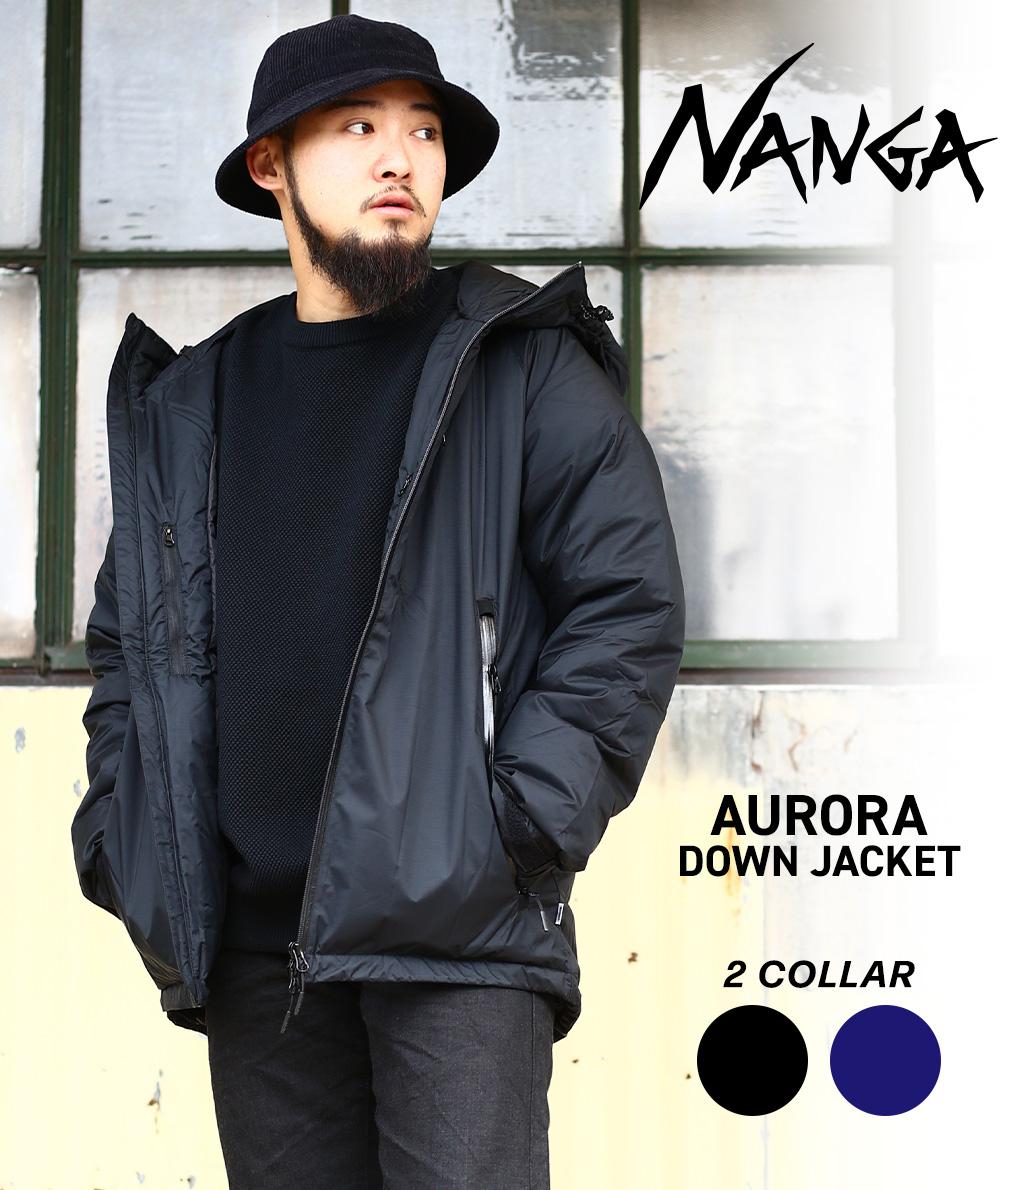 NANGA / ナンガ : AURORA DOWN JACKET / 全2色 : オーロラ ダウンジャケット 日本製 アウター ストリート アウトドア ヨーロピアンダックダウン : AURORA-DOWN-JACKET 【AST】【REA】